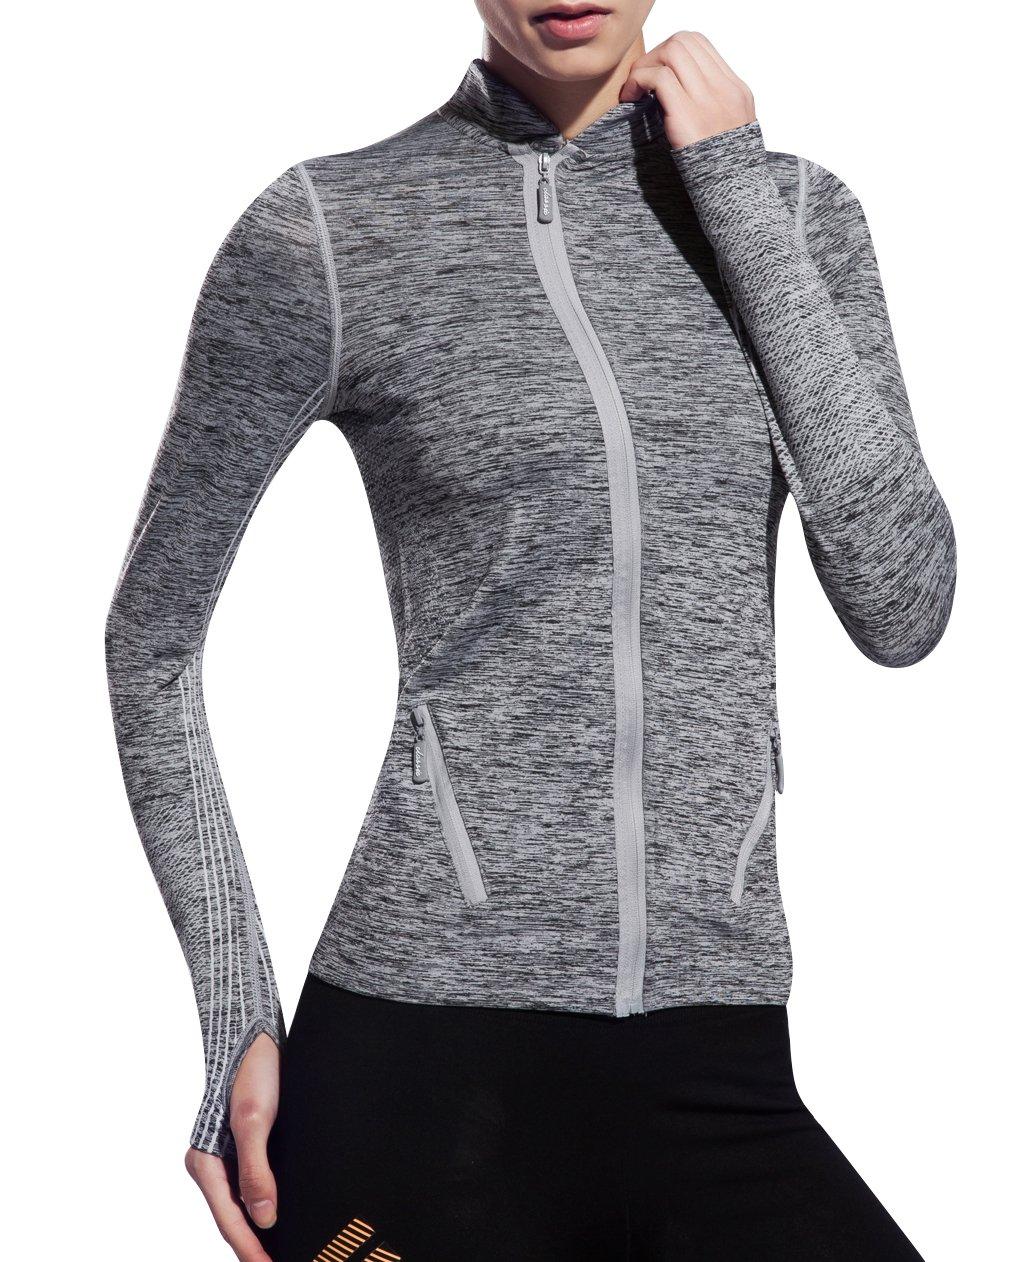 UDIY Women Yoga Jacket-Slim Sports Full Zip Coat with Two Size Pockets-Gray